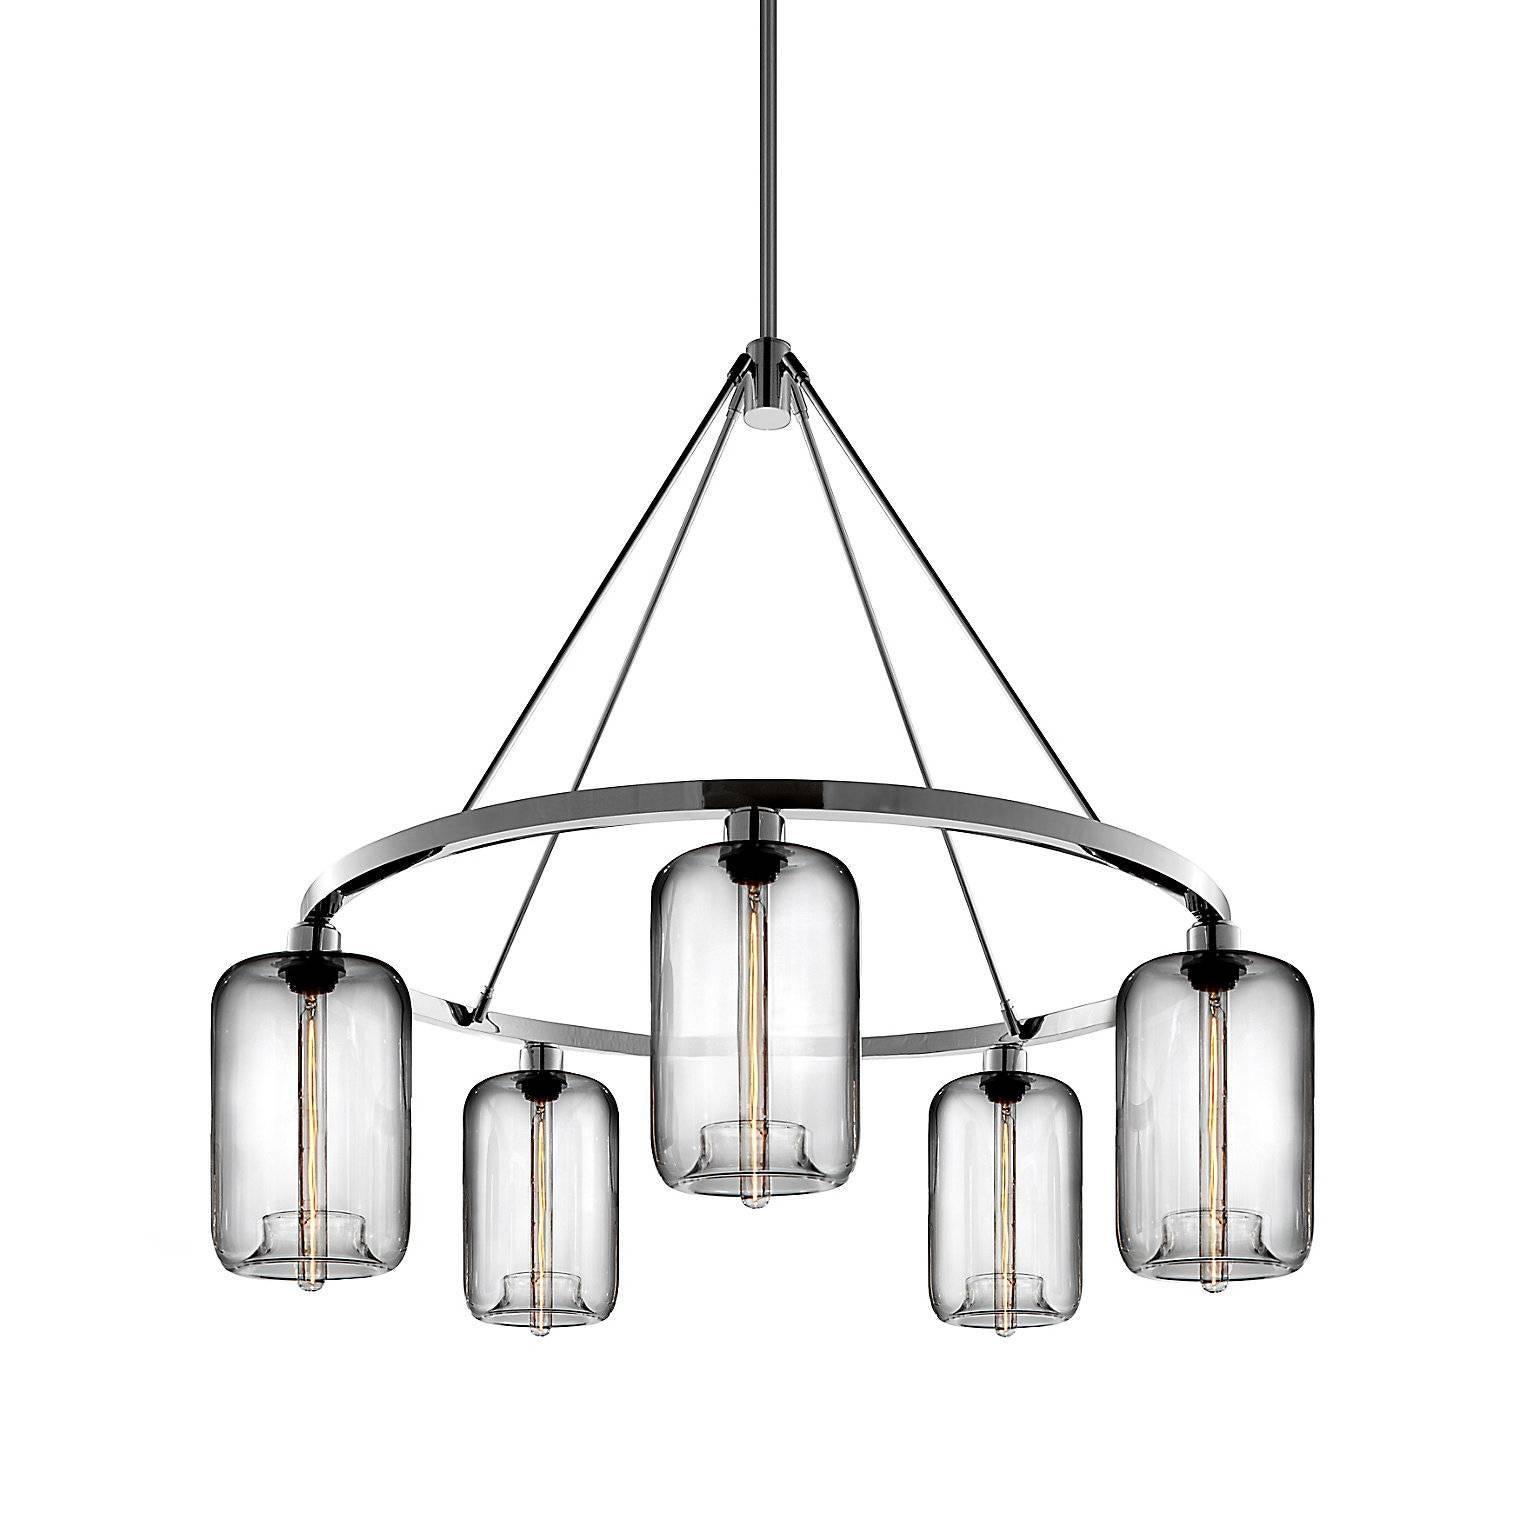 Pod Crystal Handblown Modern Glass Polished Nickel Chandelier Light